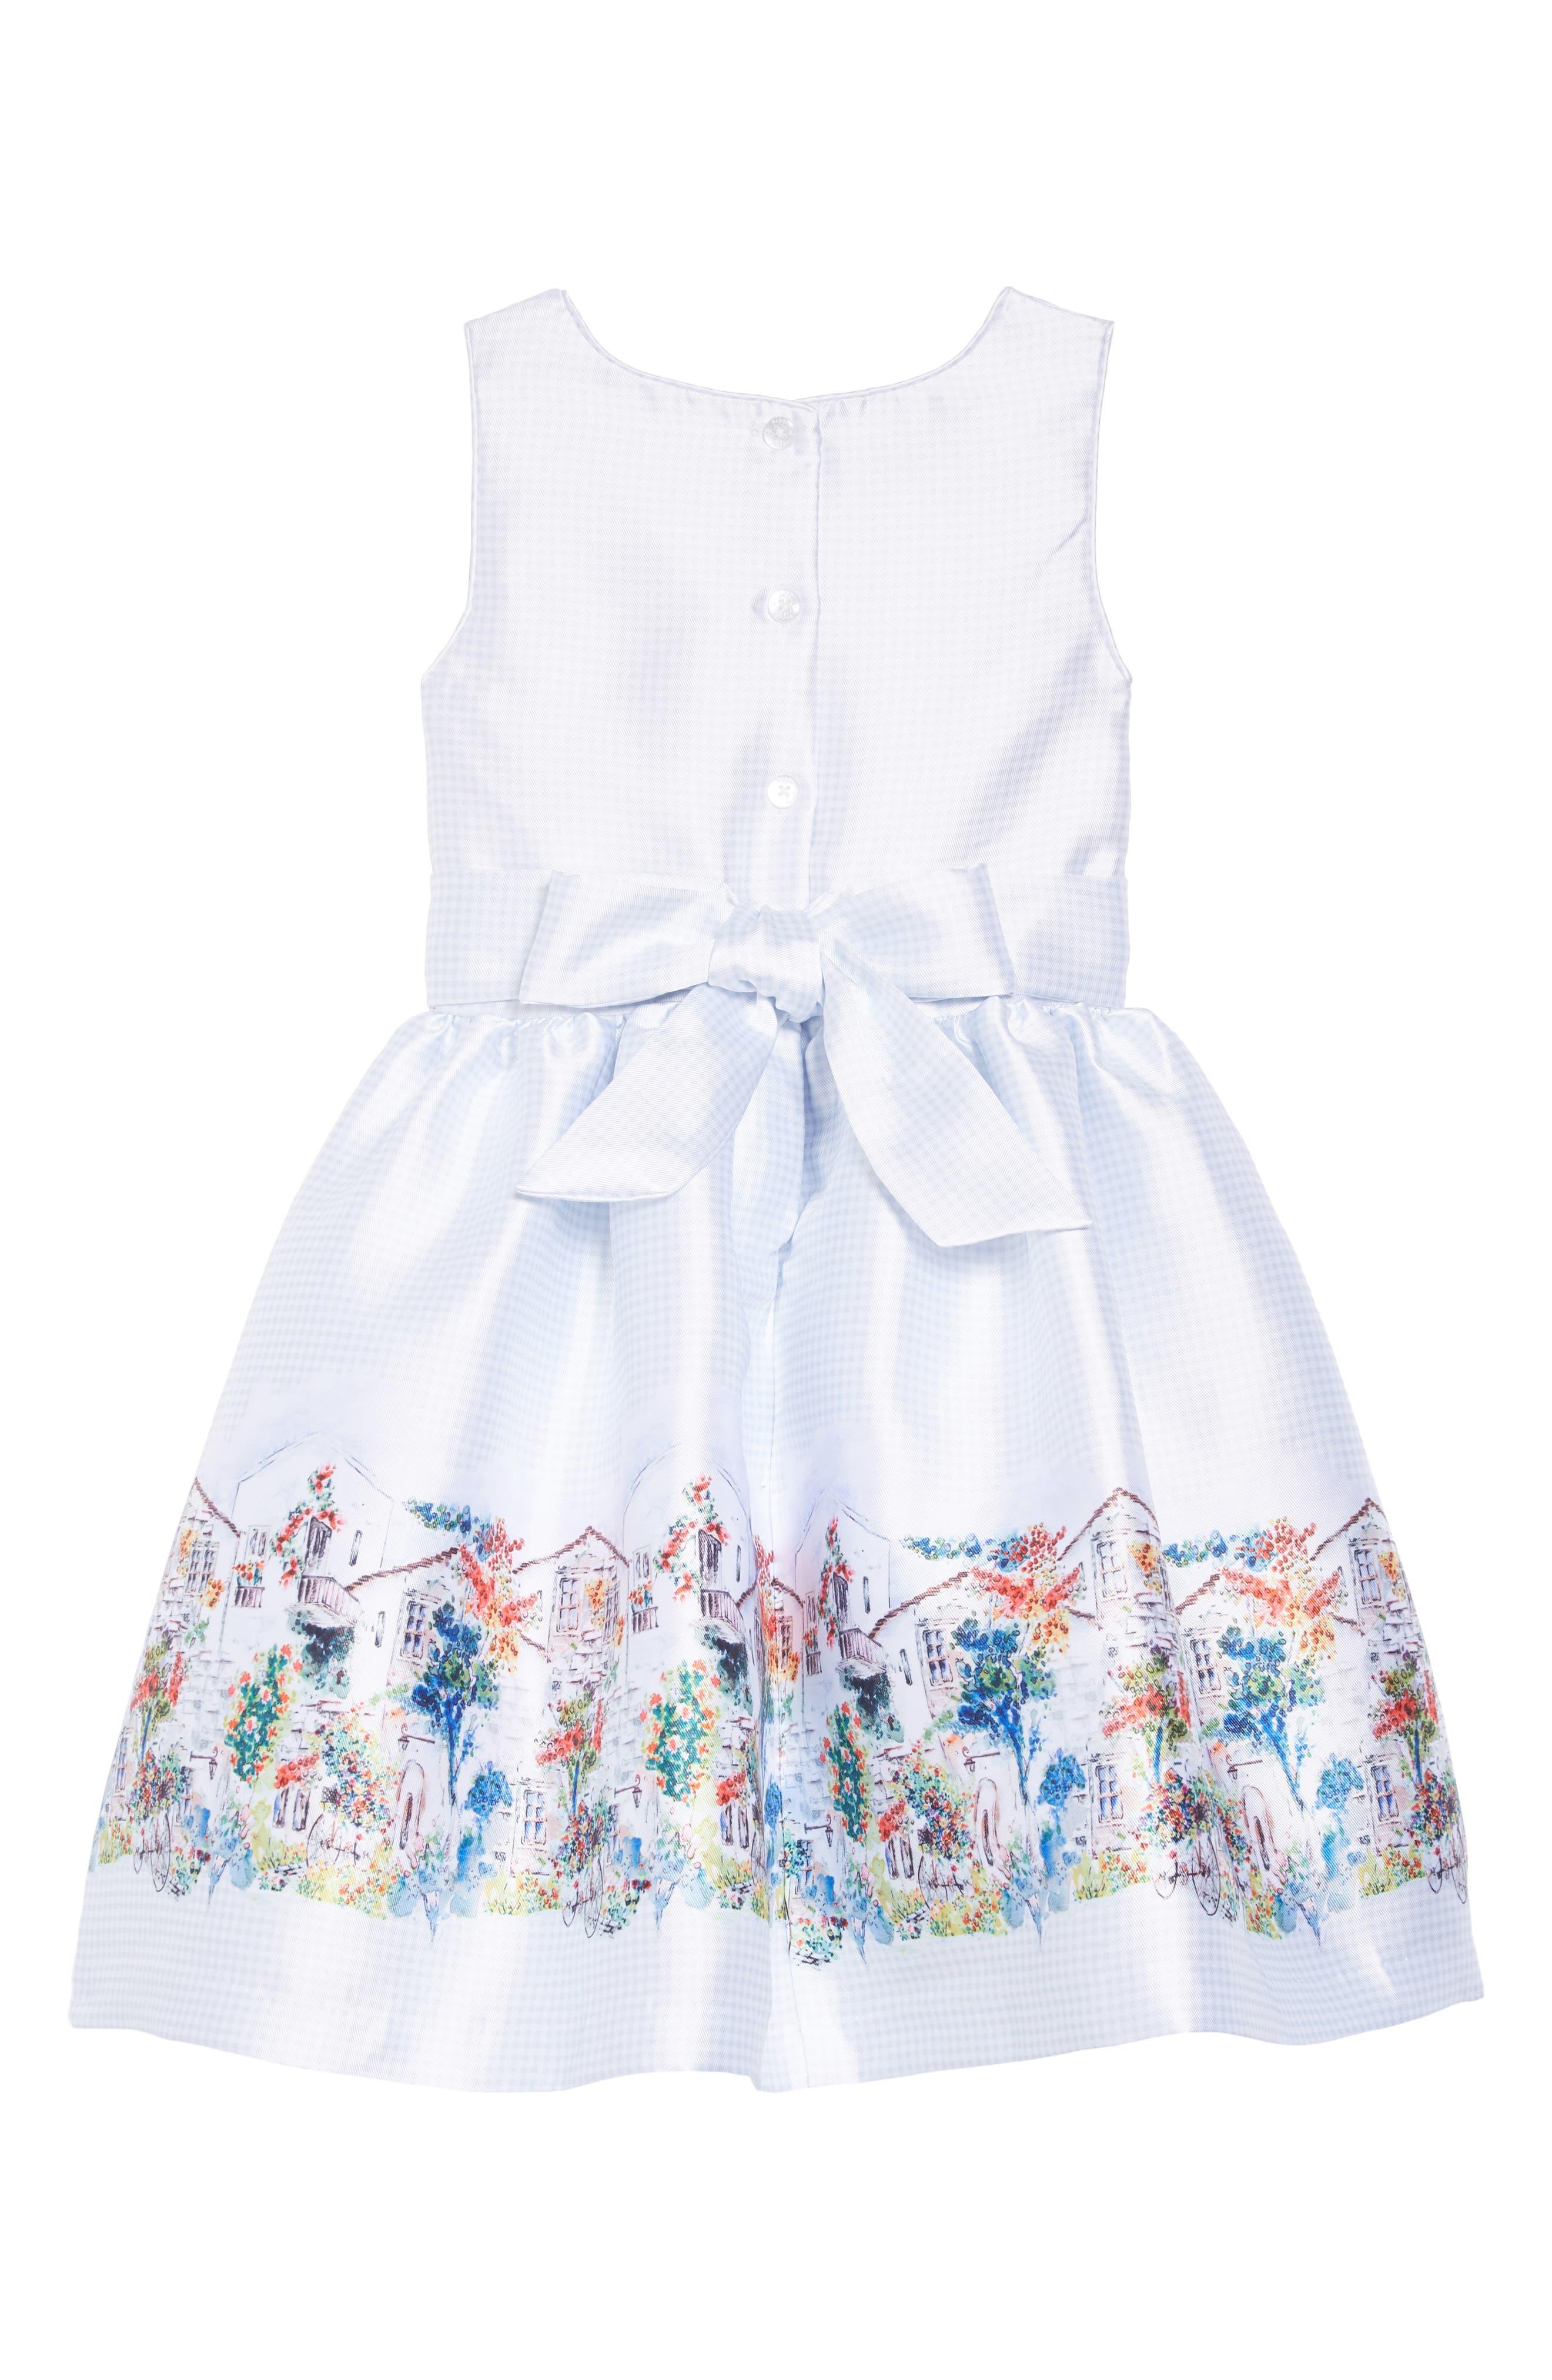 PIPPA & JULIE, Border Print Gingham Dress, Alternate thumbnail 2, color, GREY/ WHITE